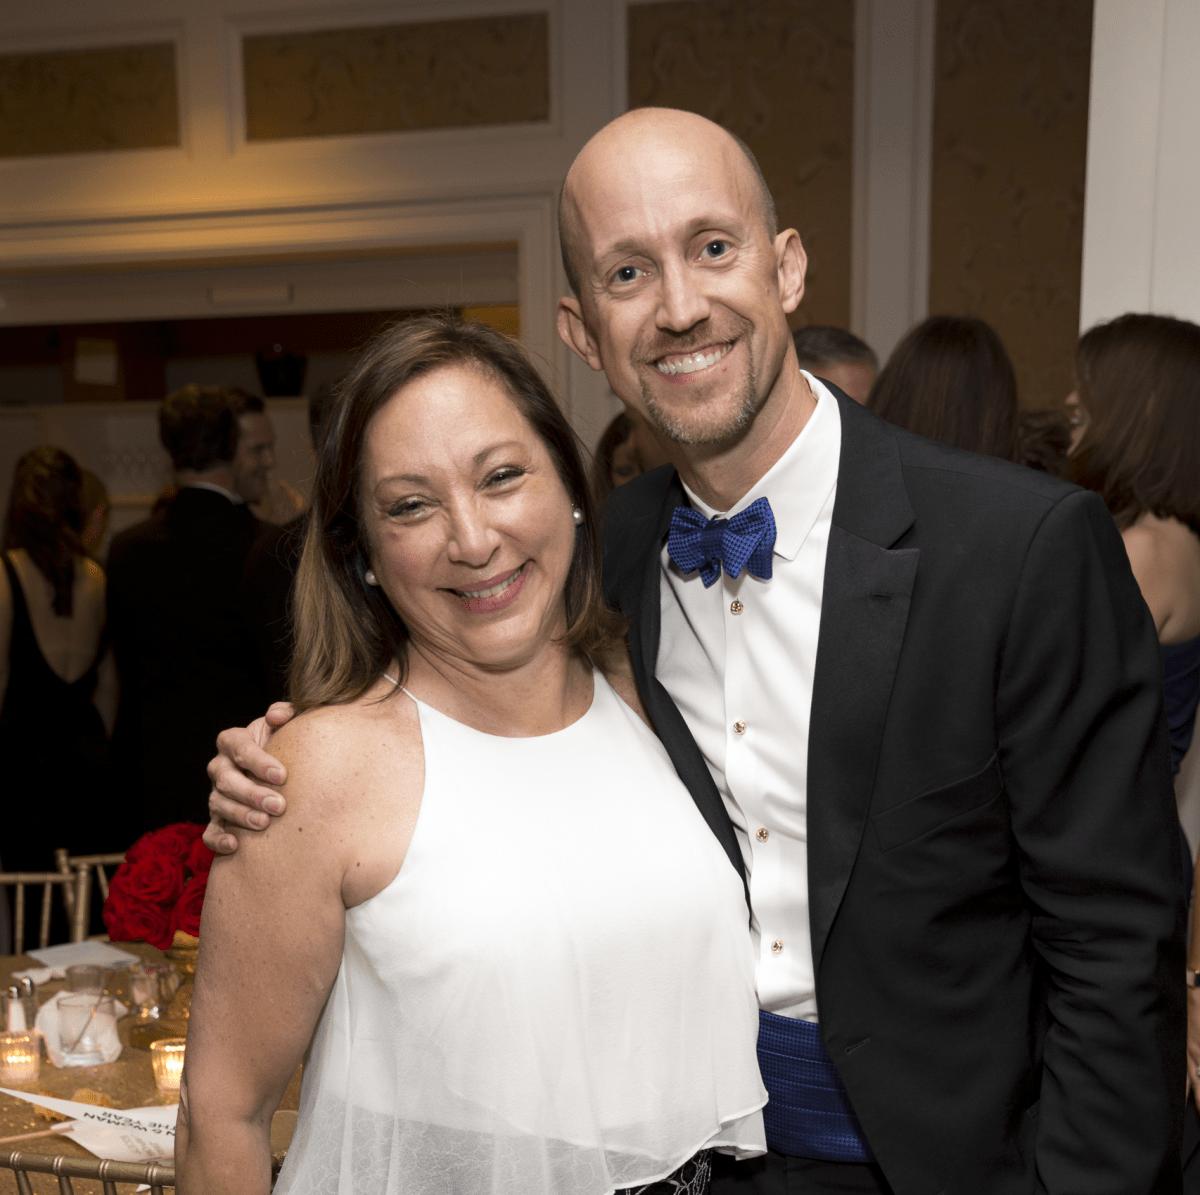 Leukemia & Lymphoma Society gala, 4/16, Vikki Evans, Mike Mahlstedt